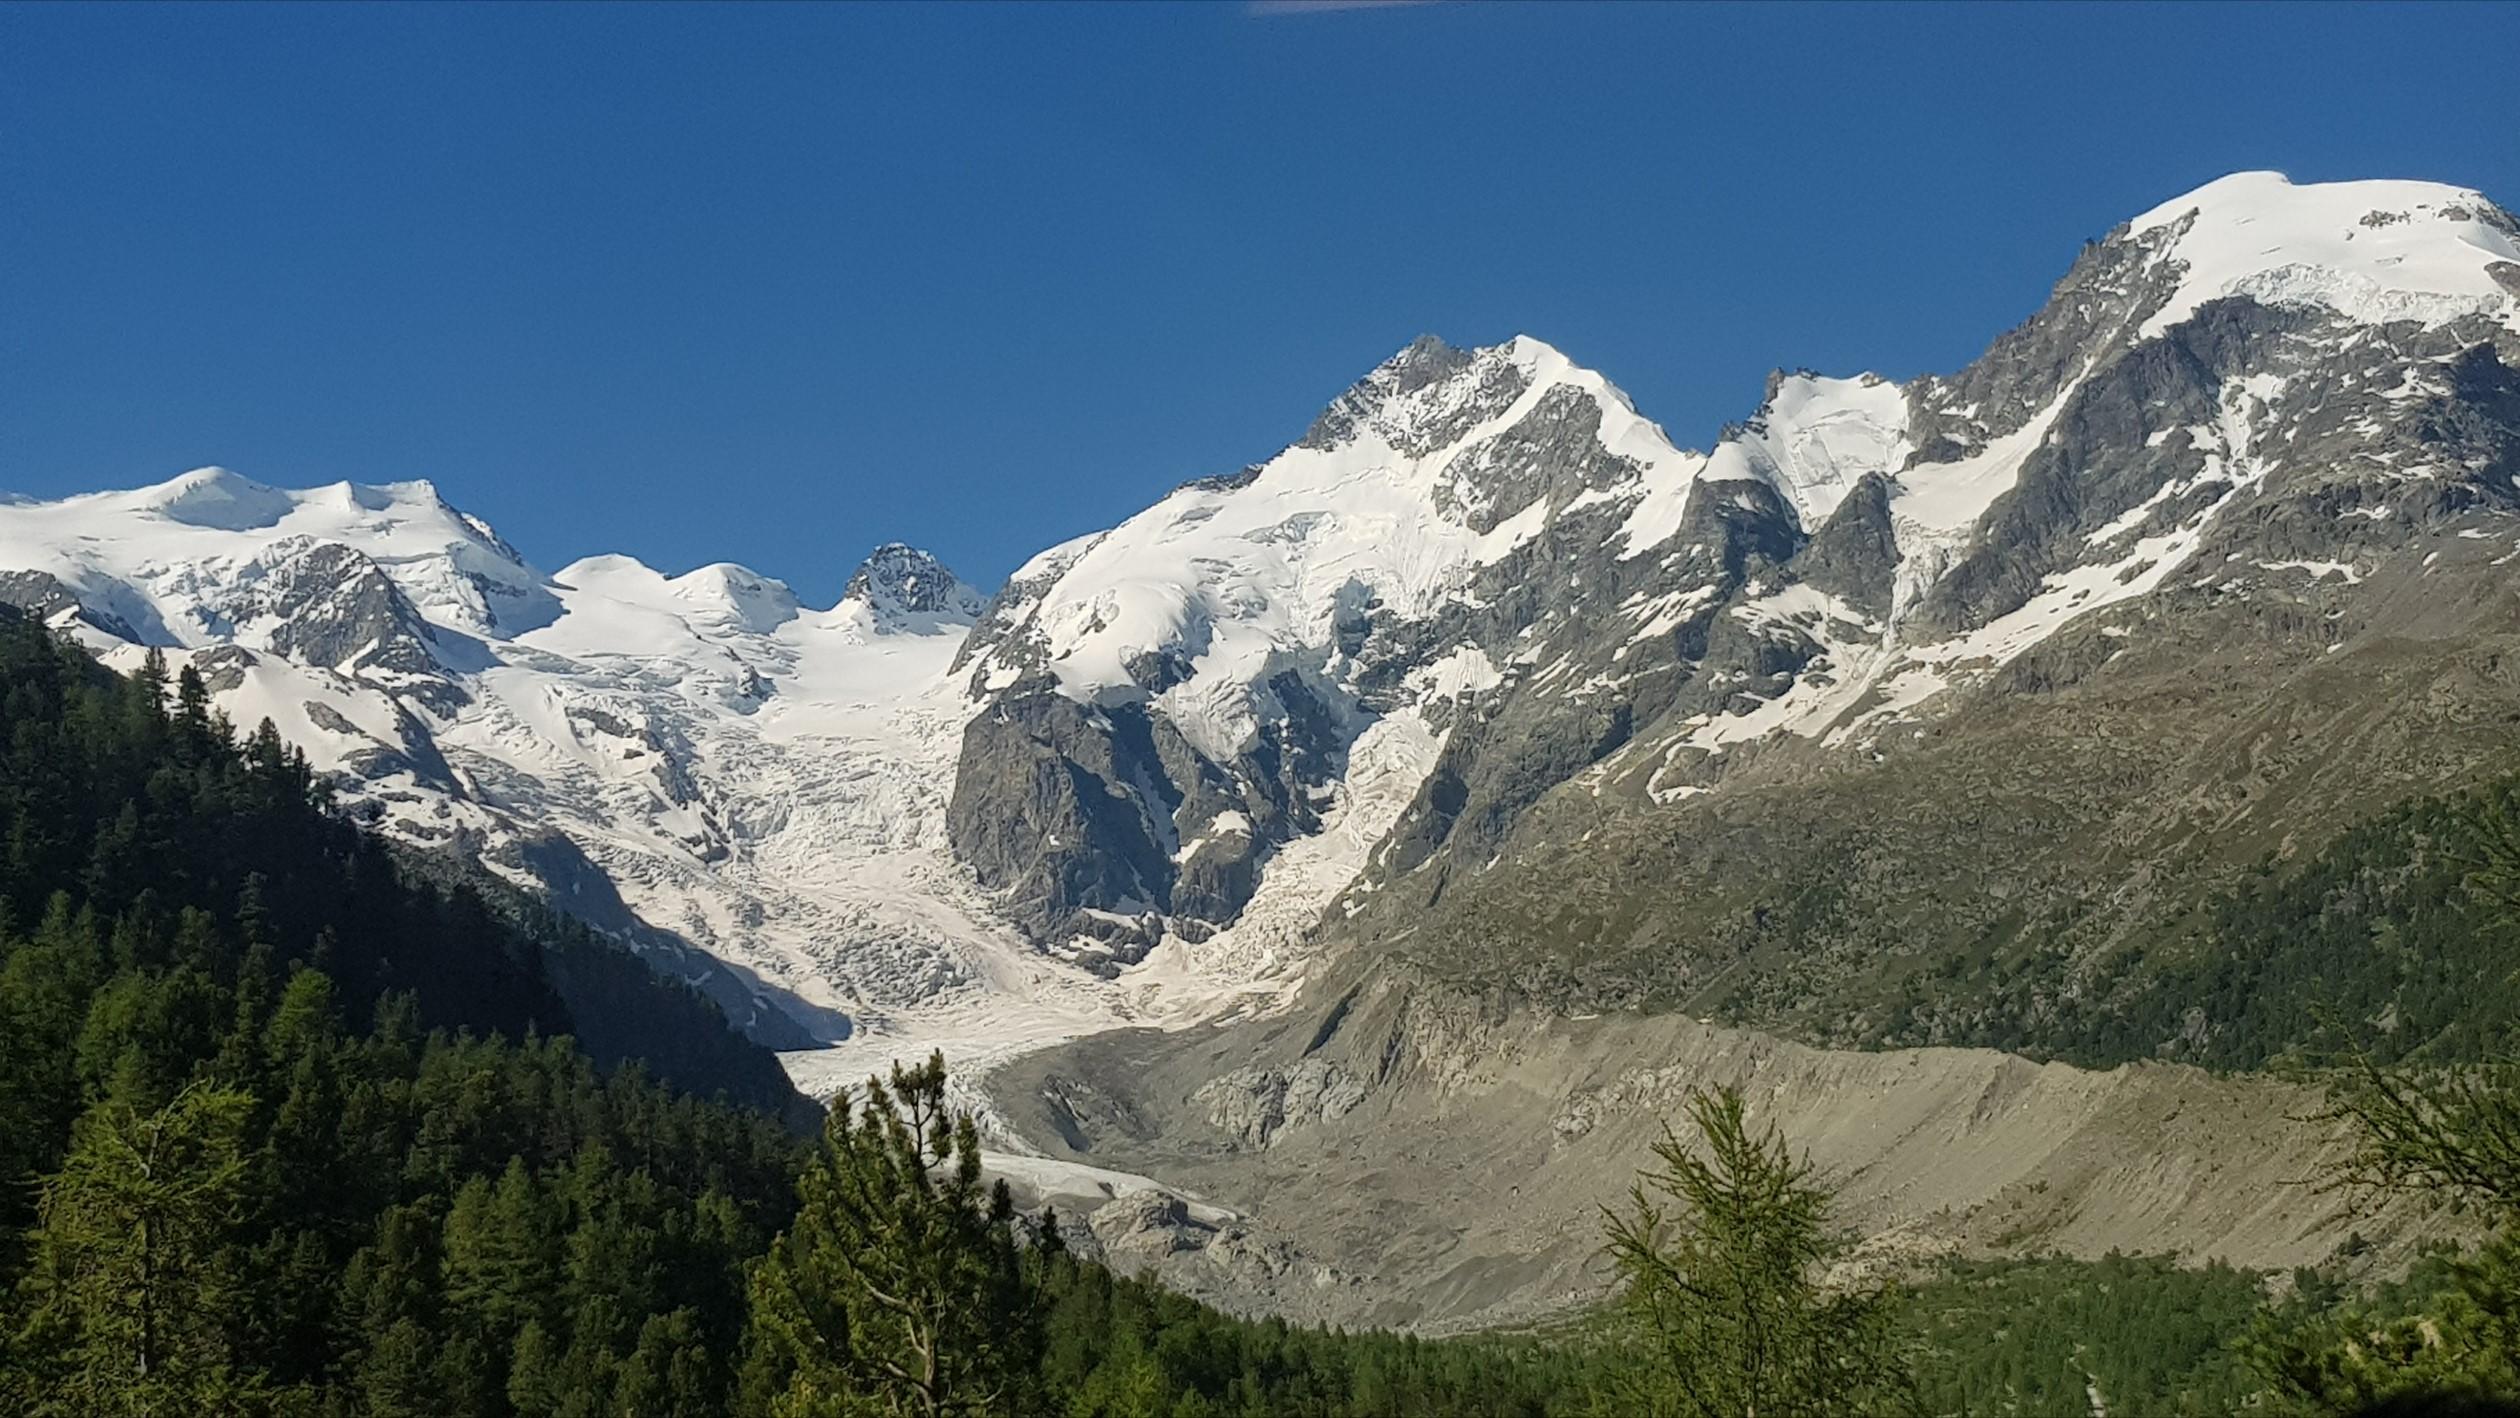 Engadine, Pontresina, Morteratsch, view on Glacier, Bellavista, Piz Boval